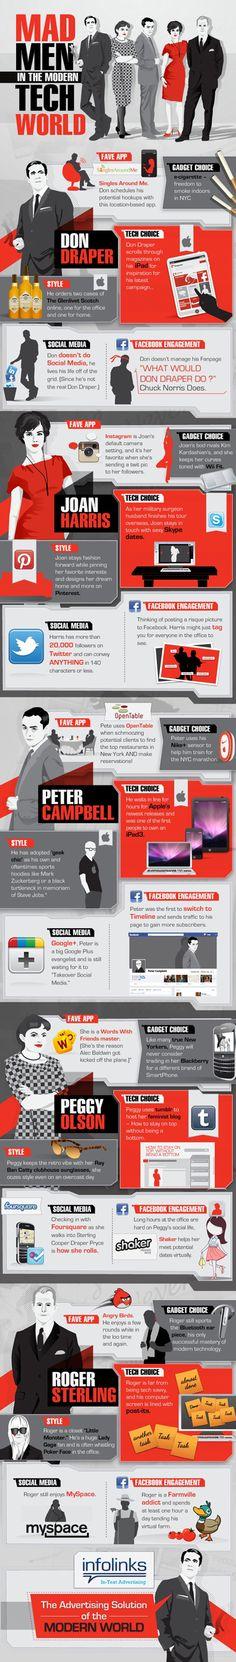 [Info Graphic] #MadMen in the modern tech world!